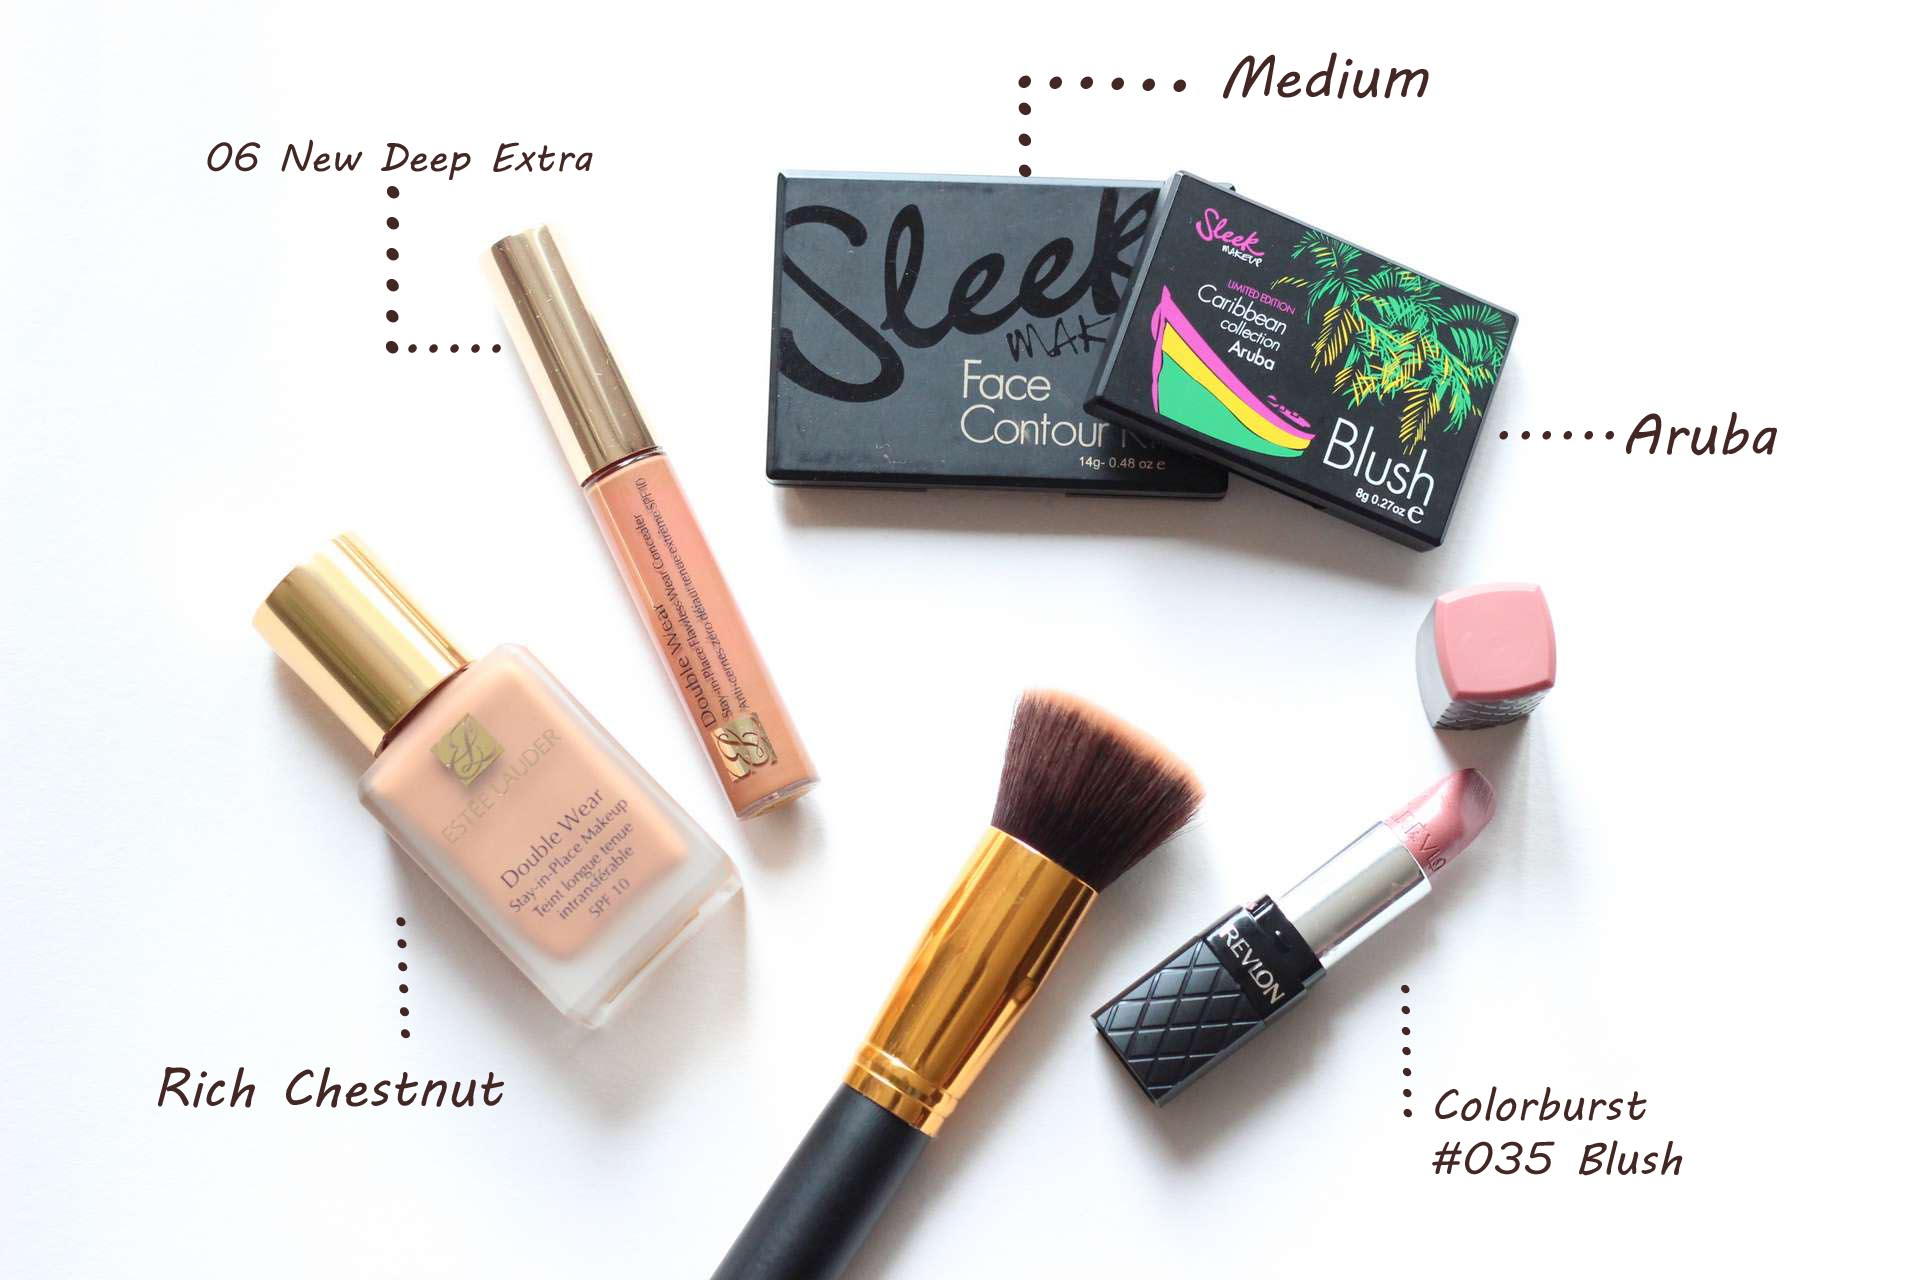 Monday-Bunday-beauty-blogger-esteelauder-choosetobebeautiful